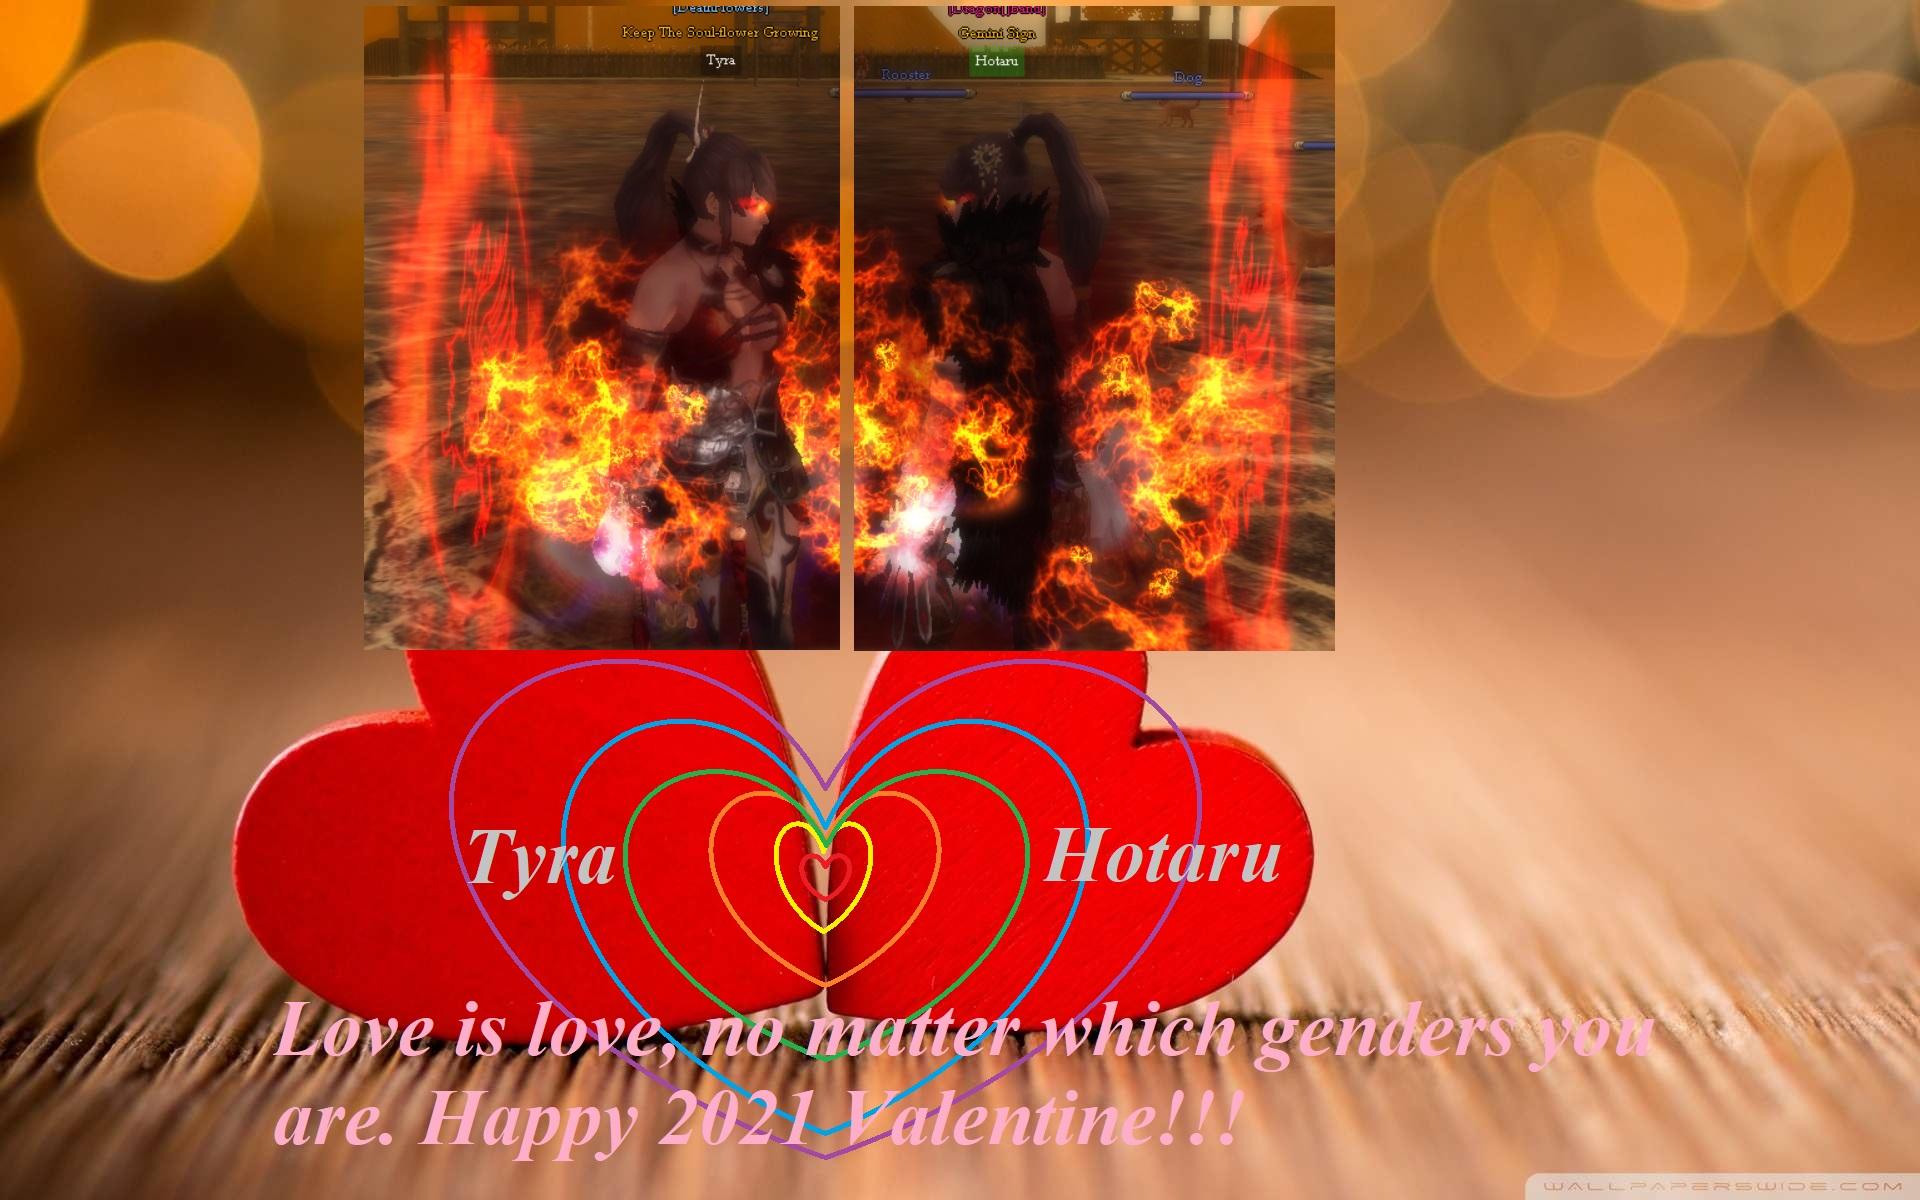 Valentine-Tyra+Hotaru.jpg